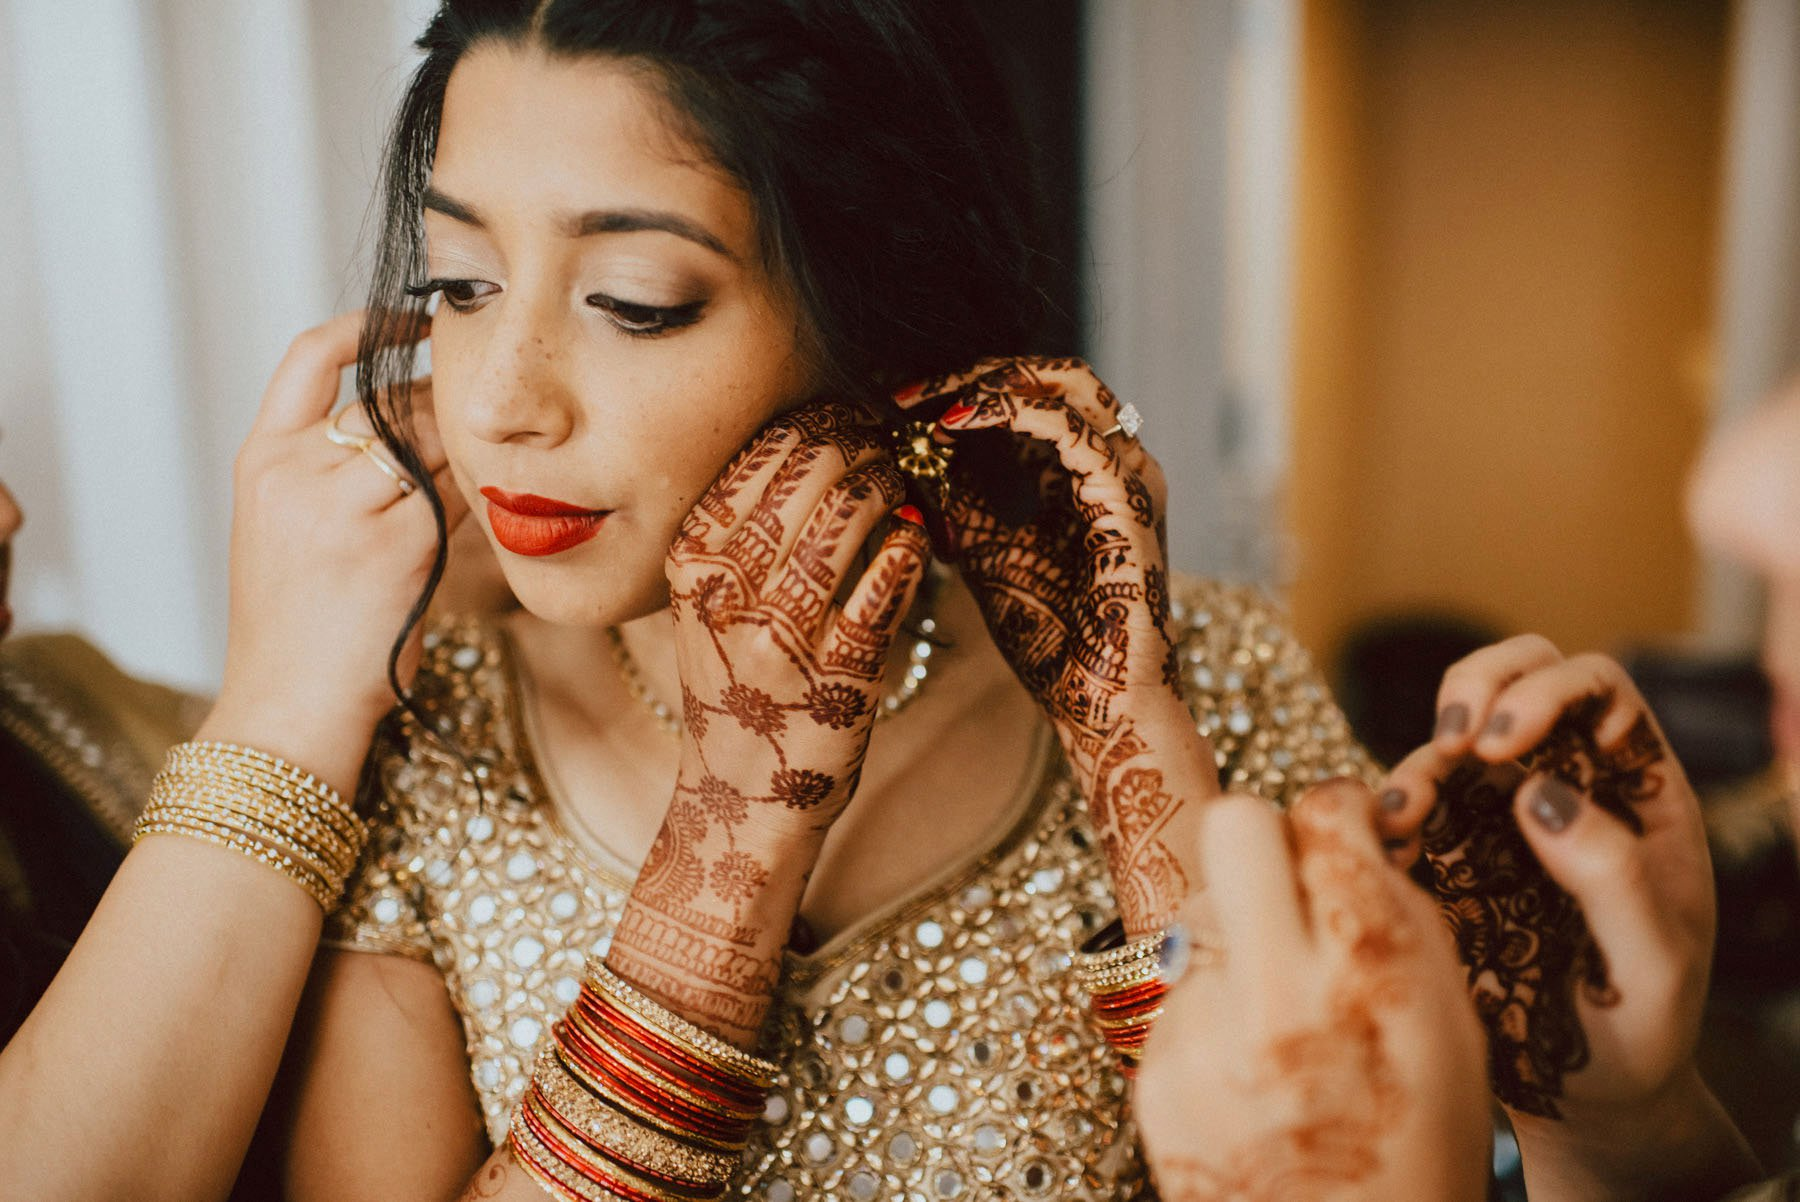 vie-philadelphia-indian-wedding-16.jpg